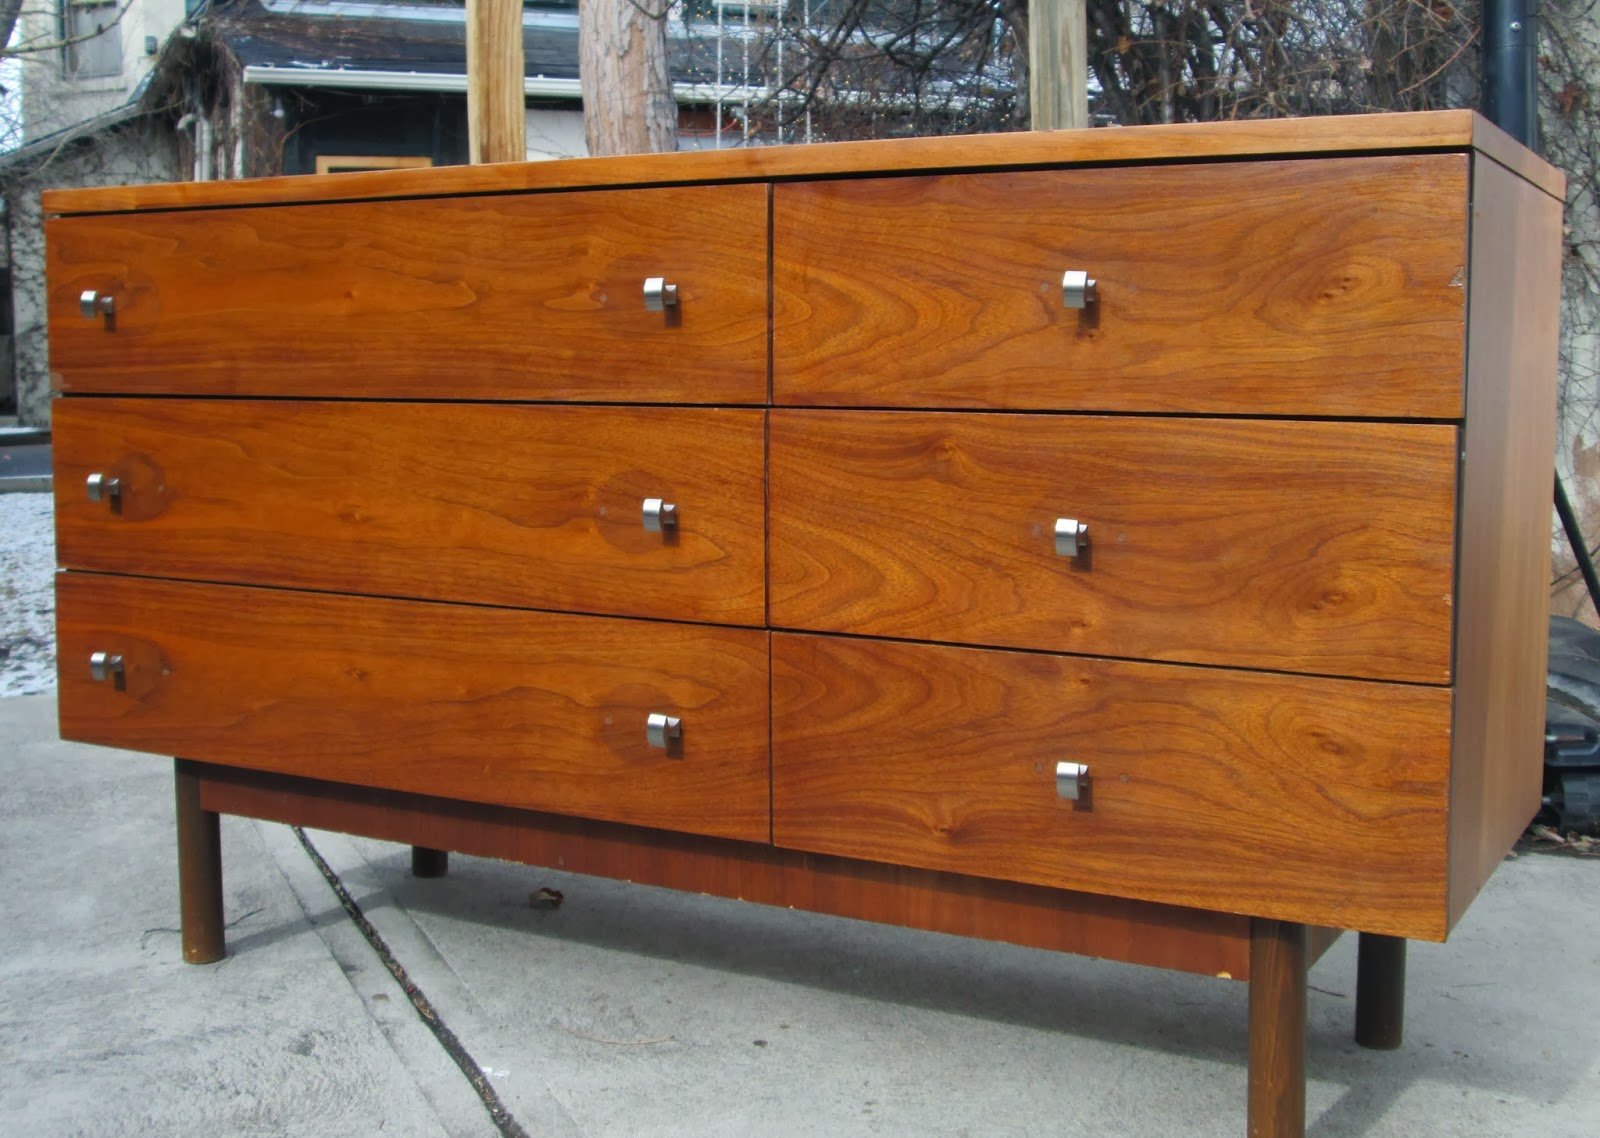 6 Drawer Mid Century Dresser By Stanley Sold